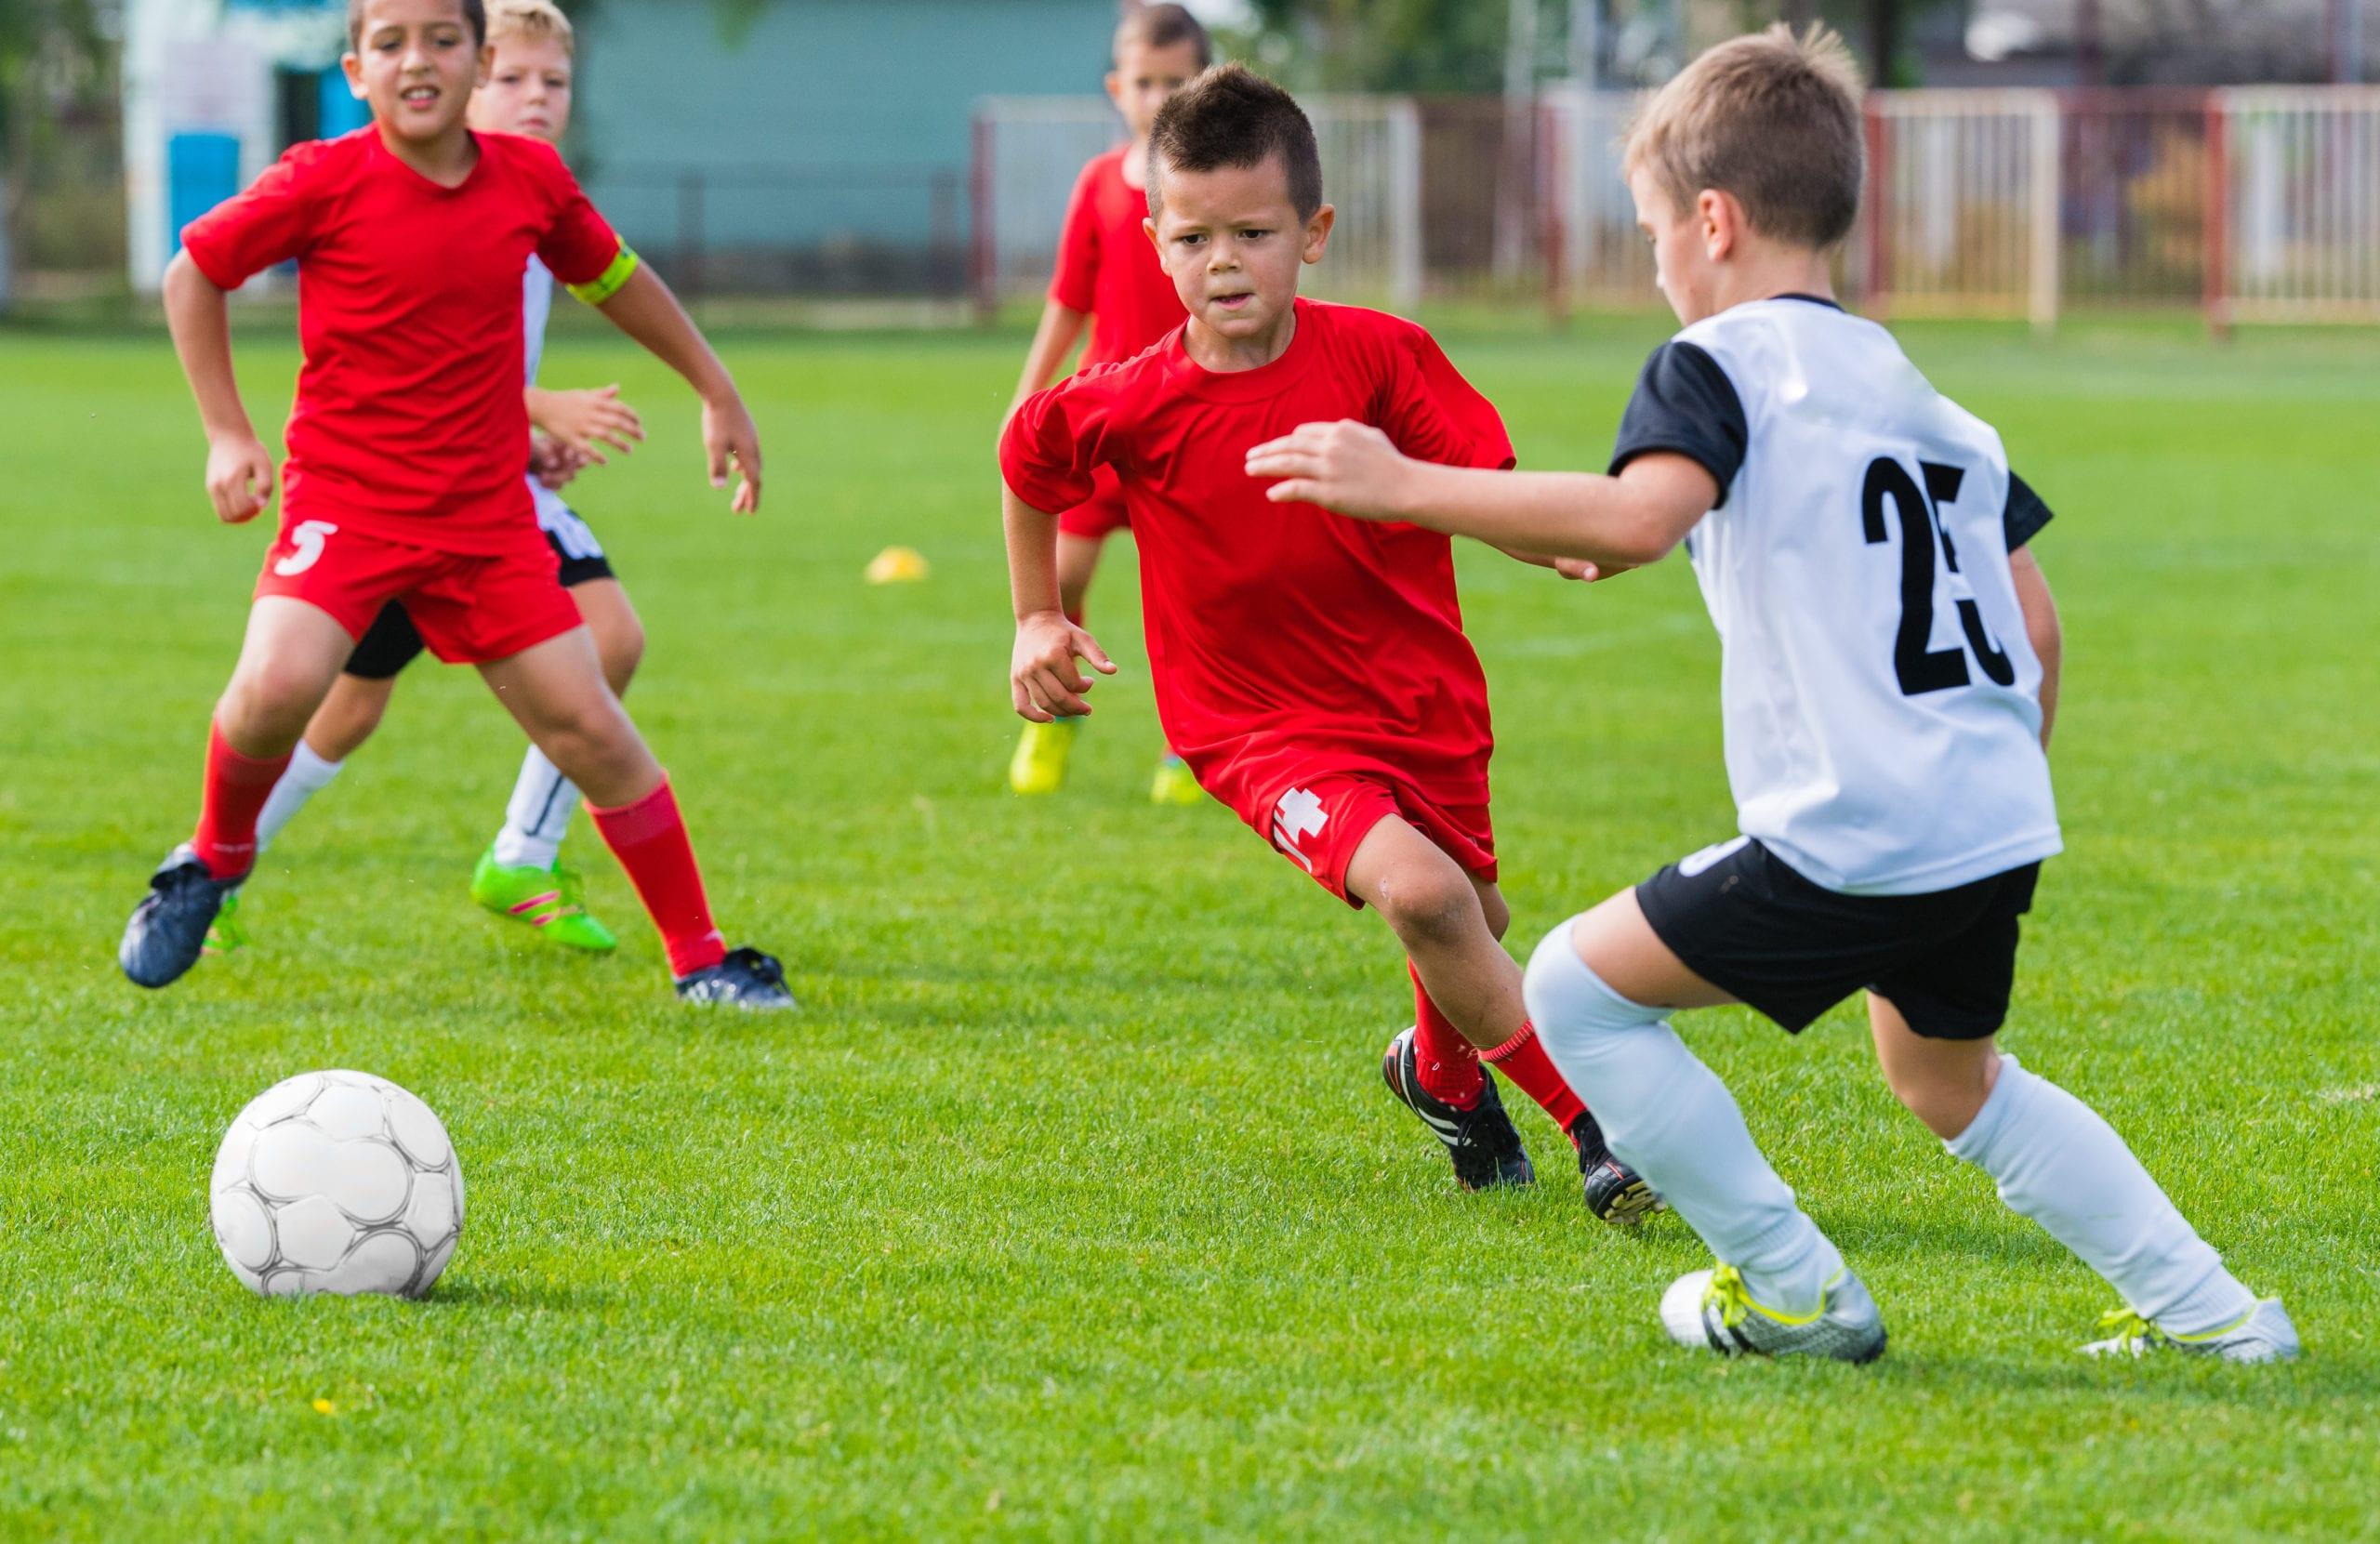 boys kicking soccer ball on the sports field austin